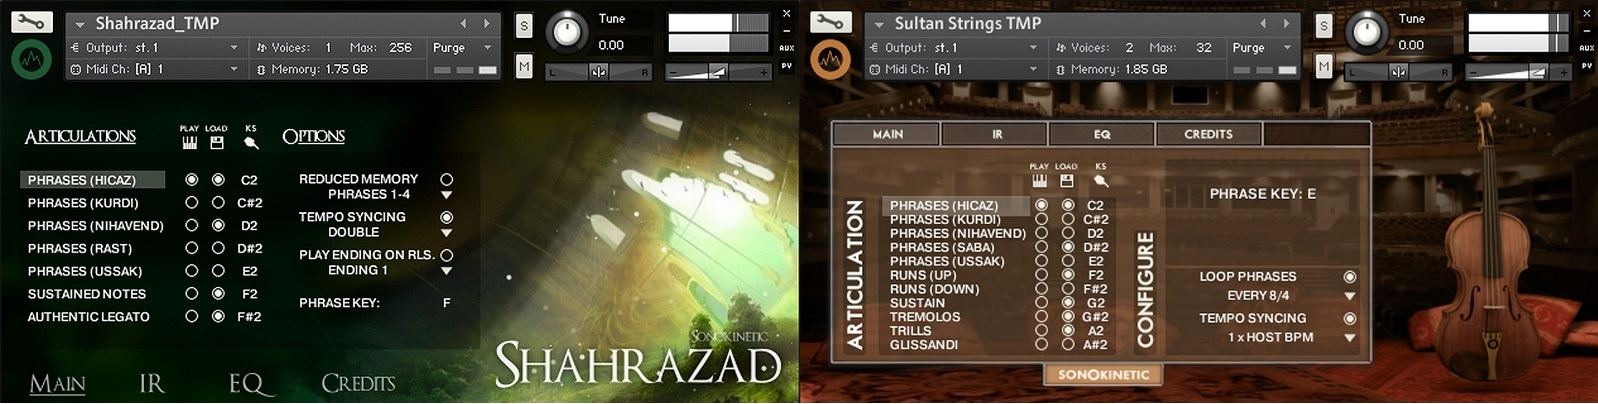 Test: Sample Librarys Sonokinetic Shahrazad und Sultan Strings